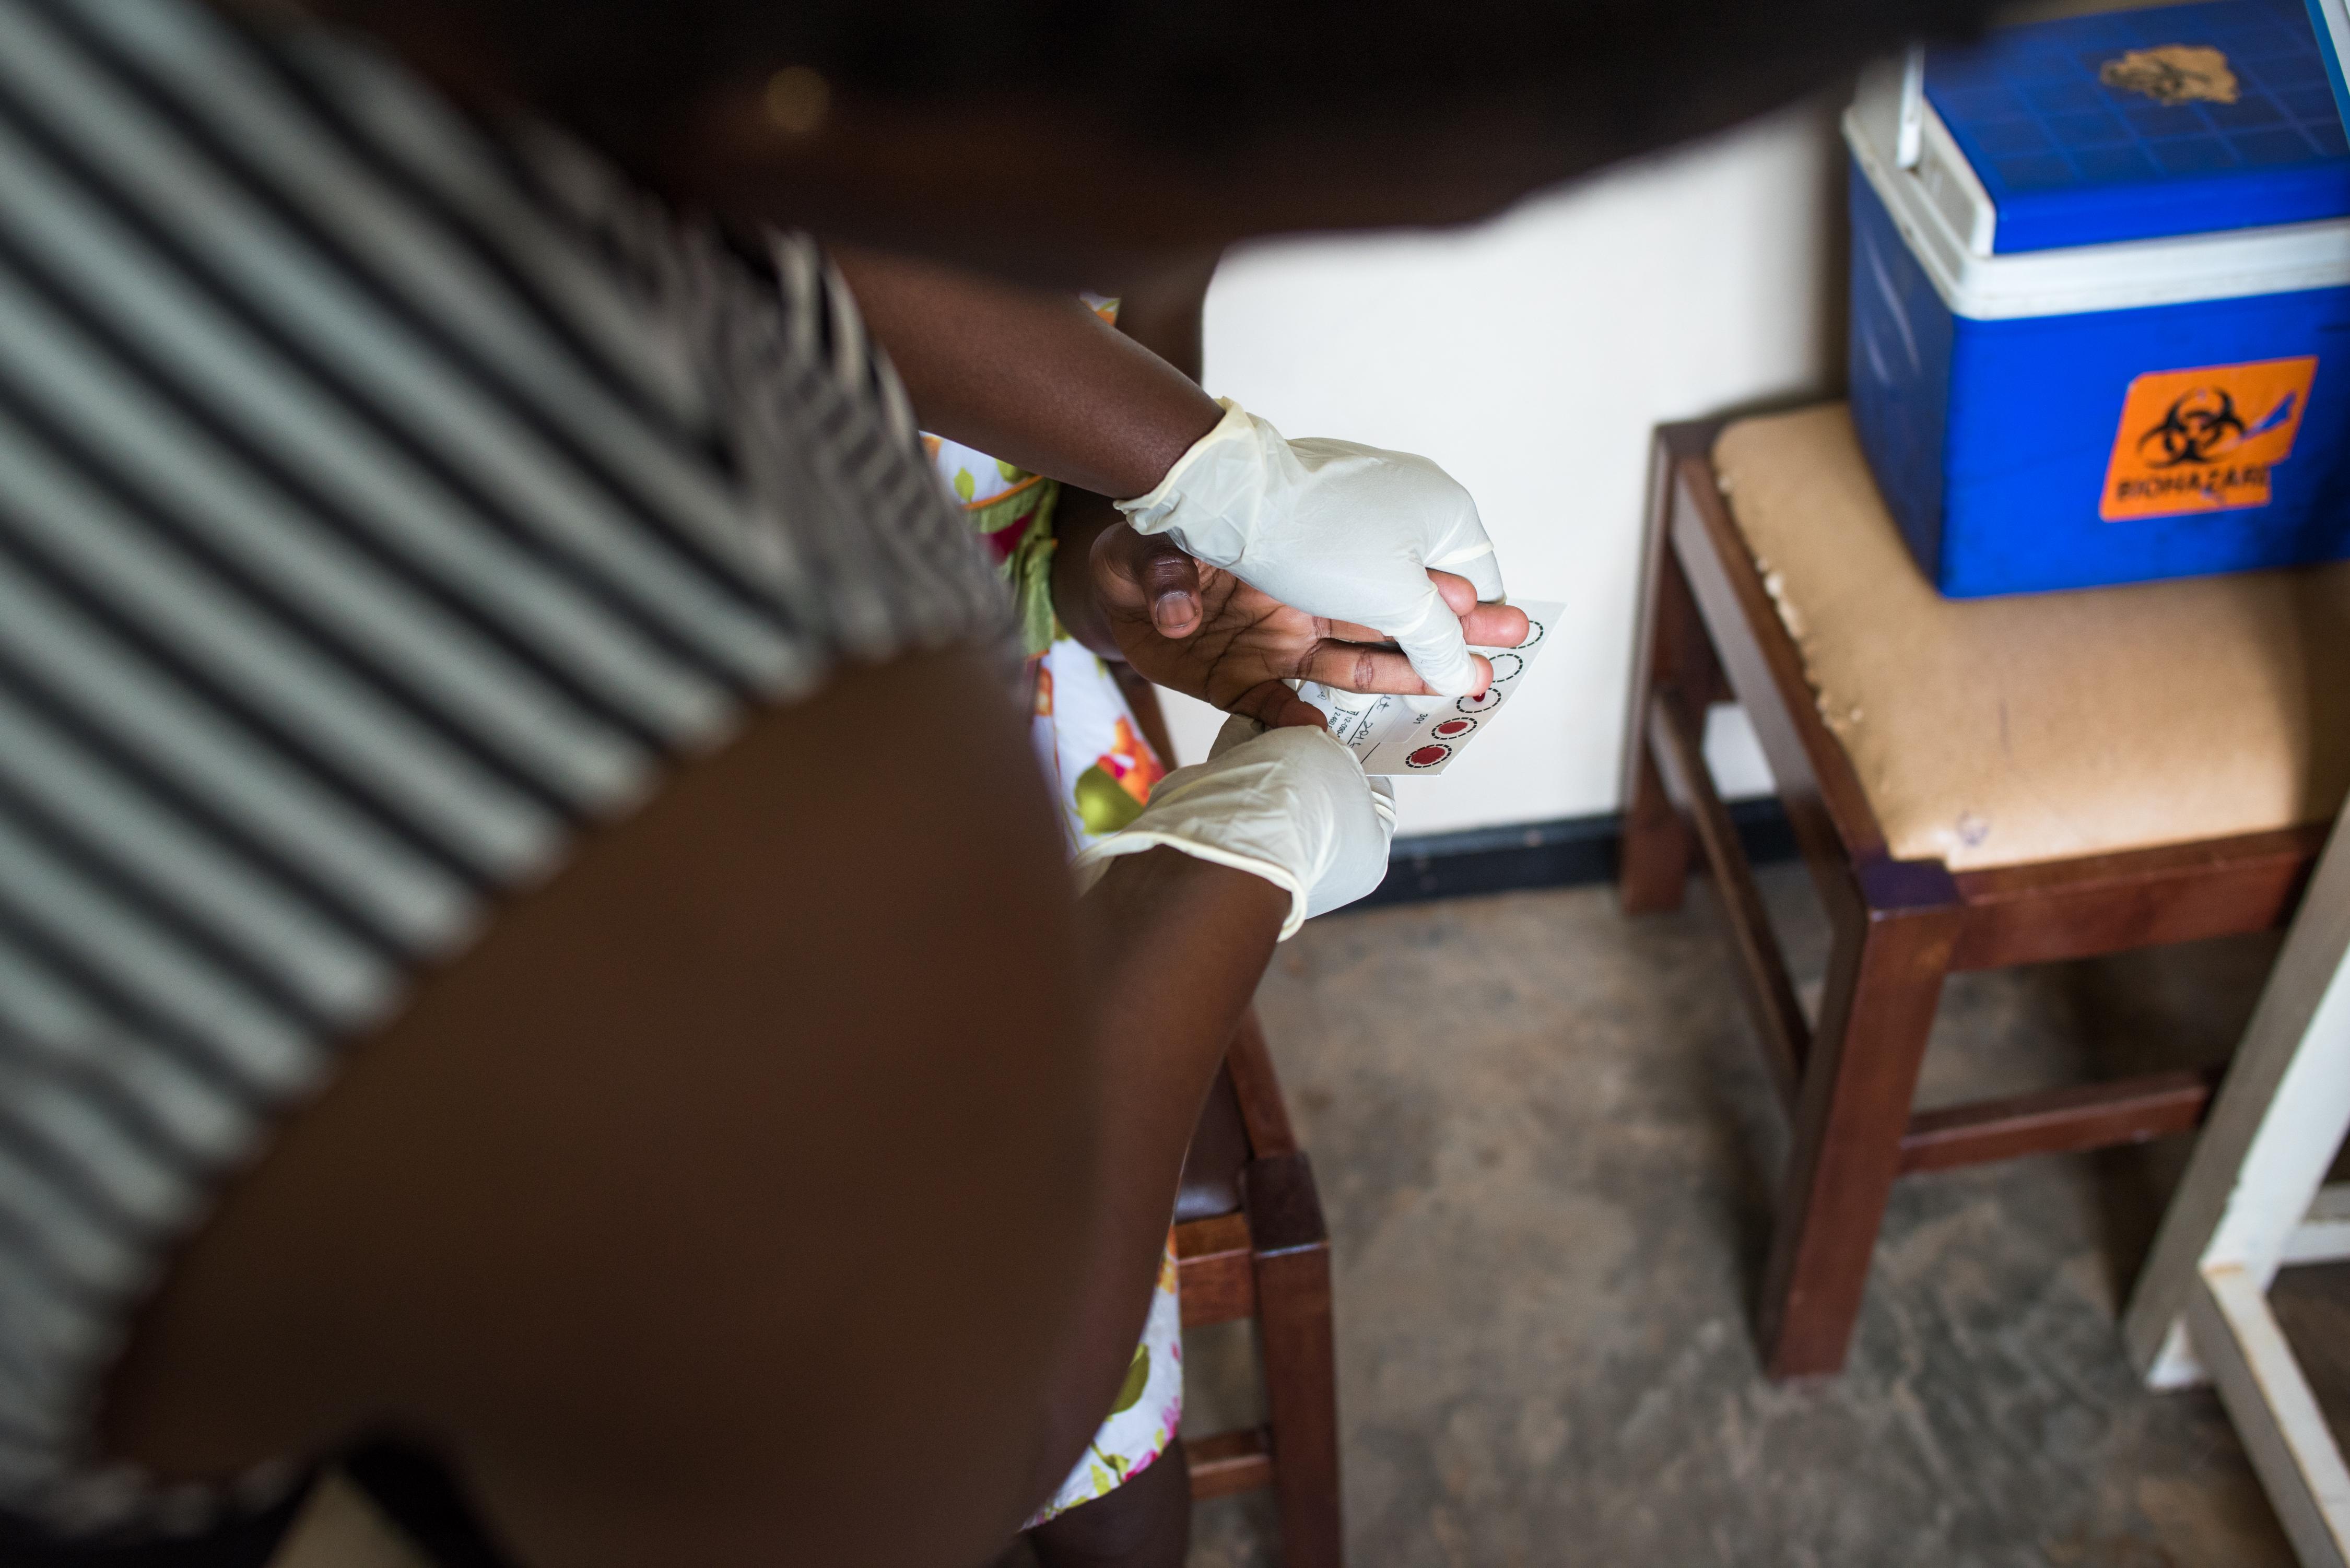 Child's hand getting HIV test